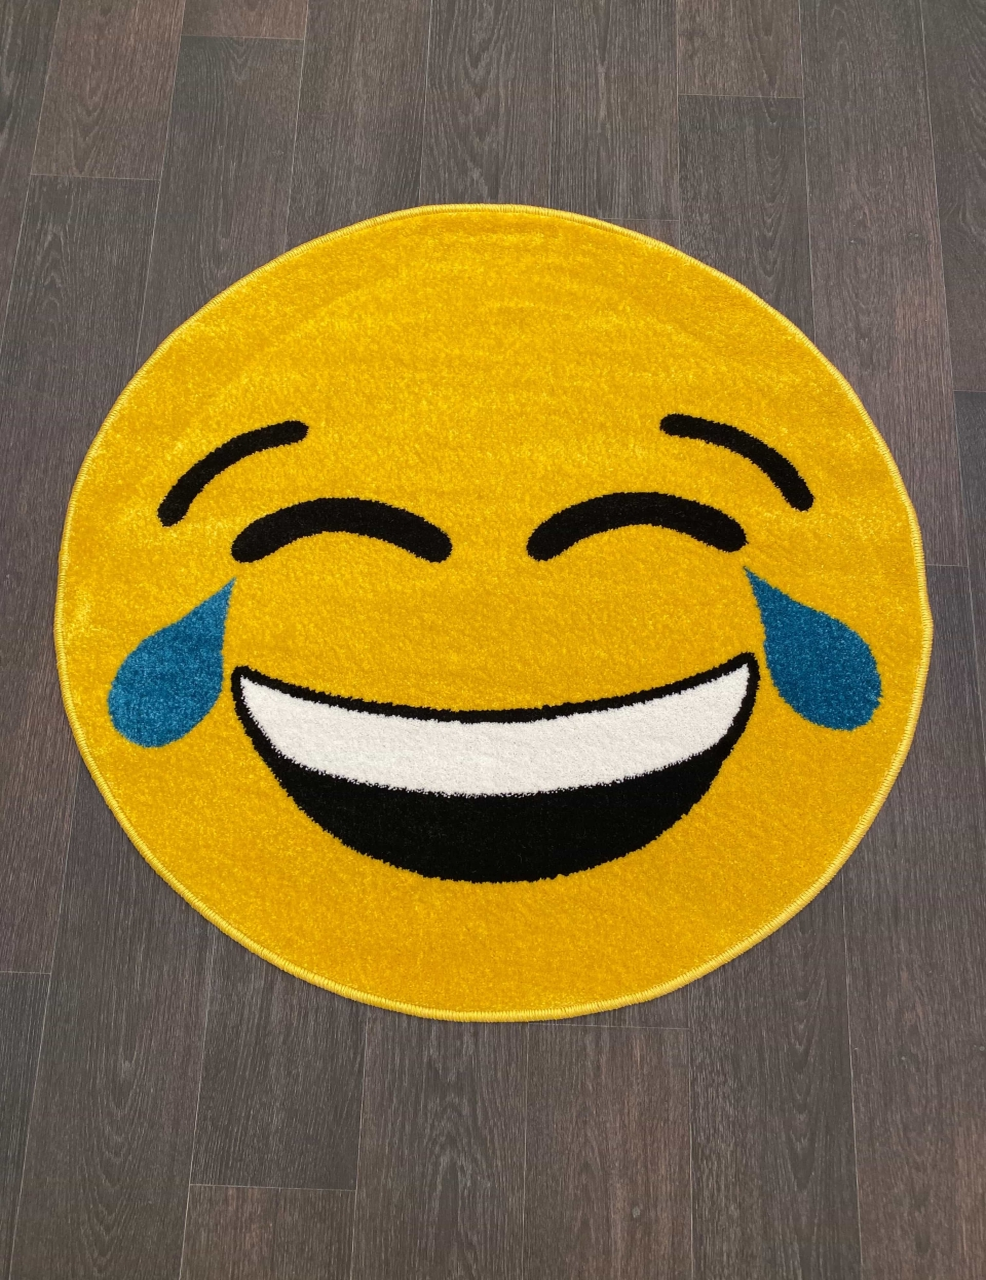 Ковер NC12 - YELLOW - Круг - коллекция SMILE - фото 1